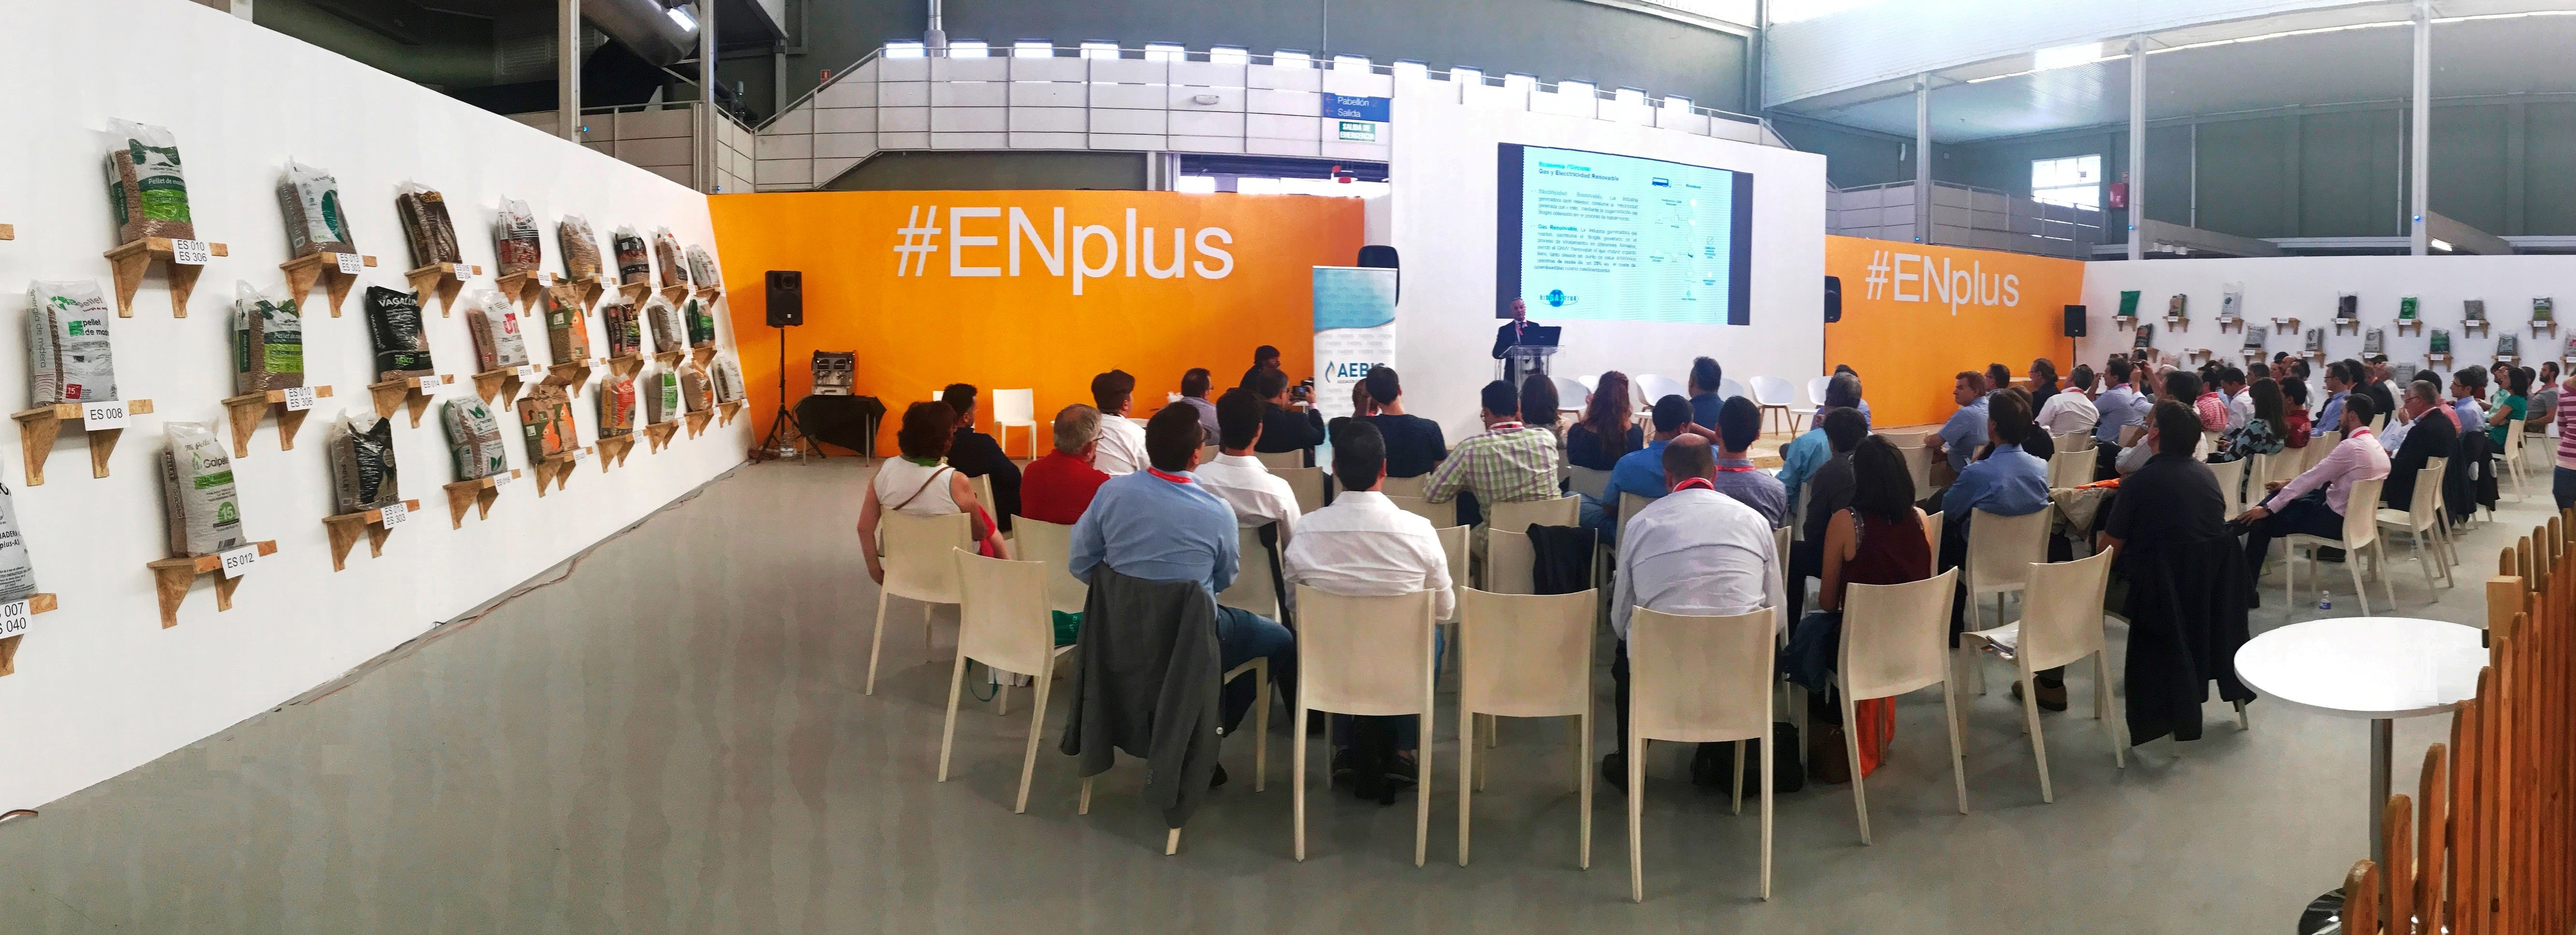 ENplus talk